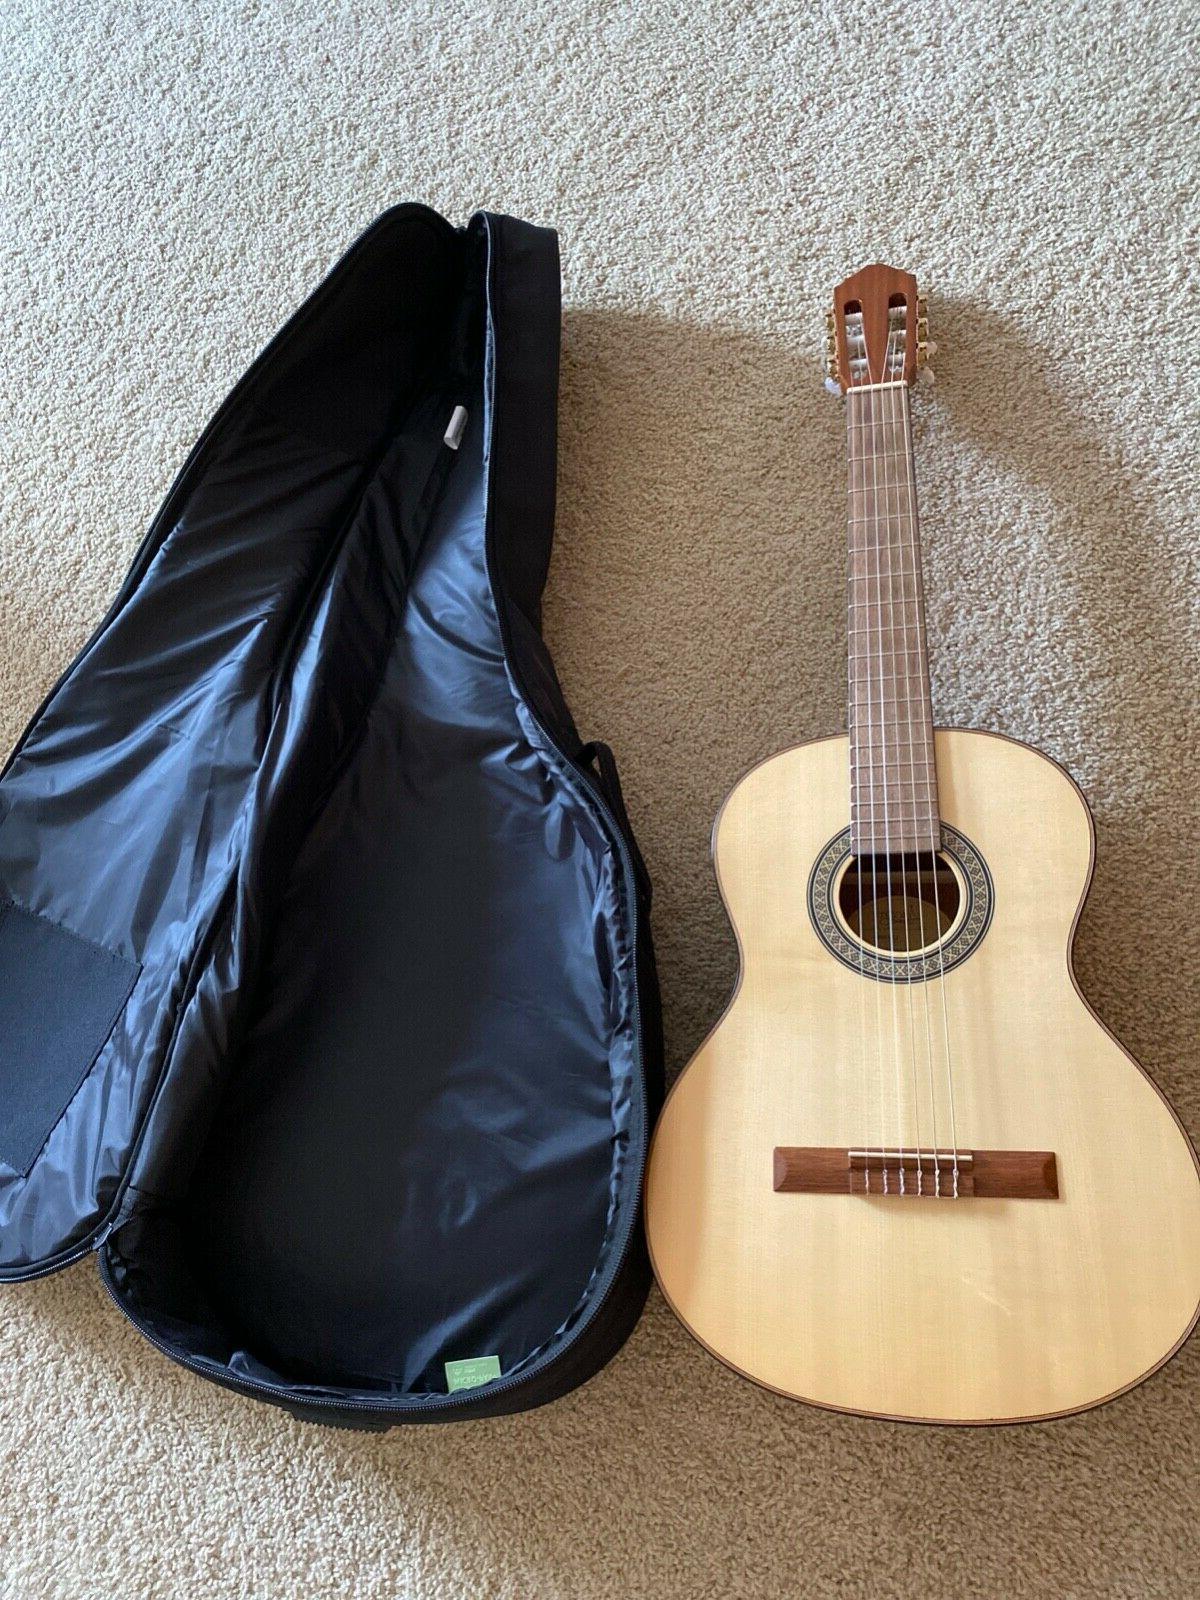 Best Choice Beginners Acoustic Guitar